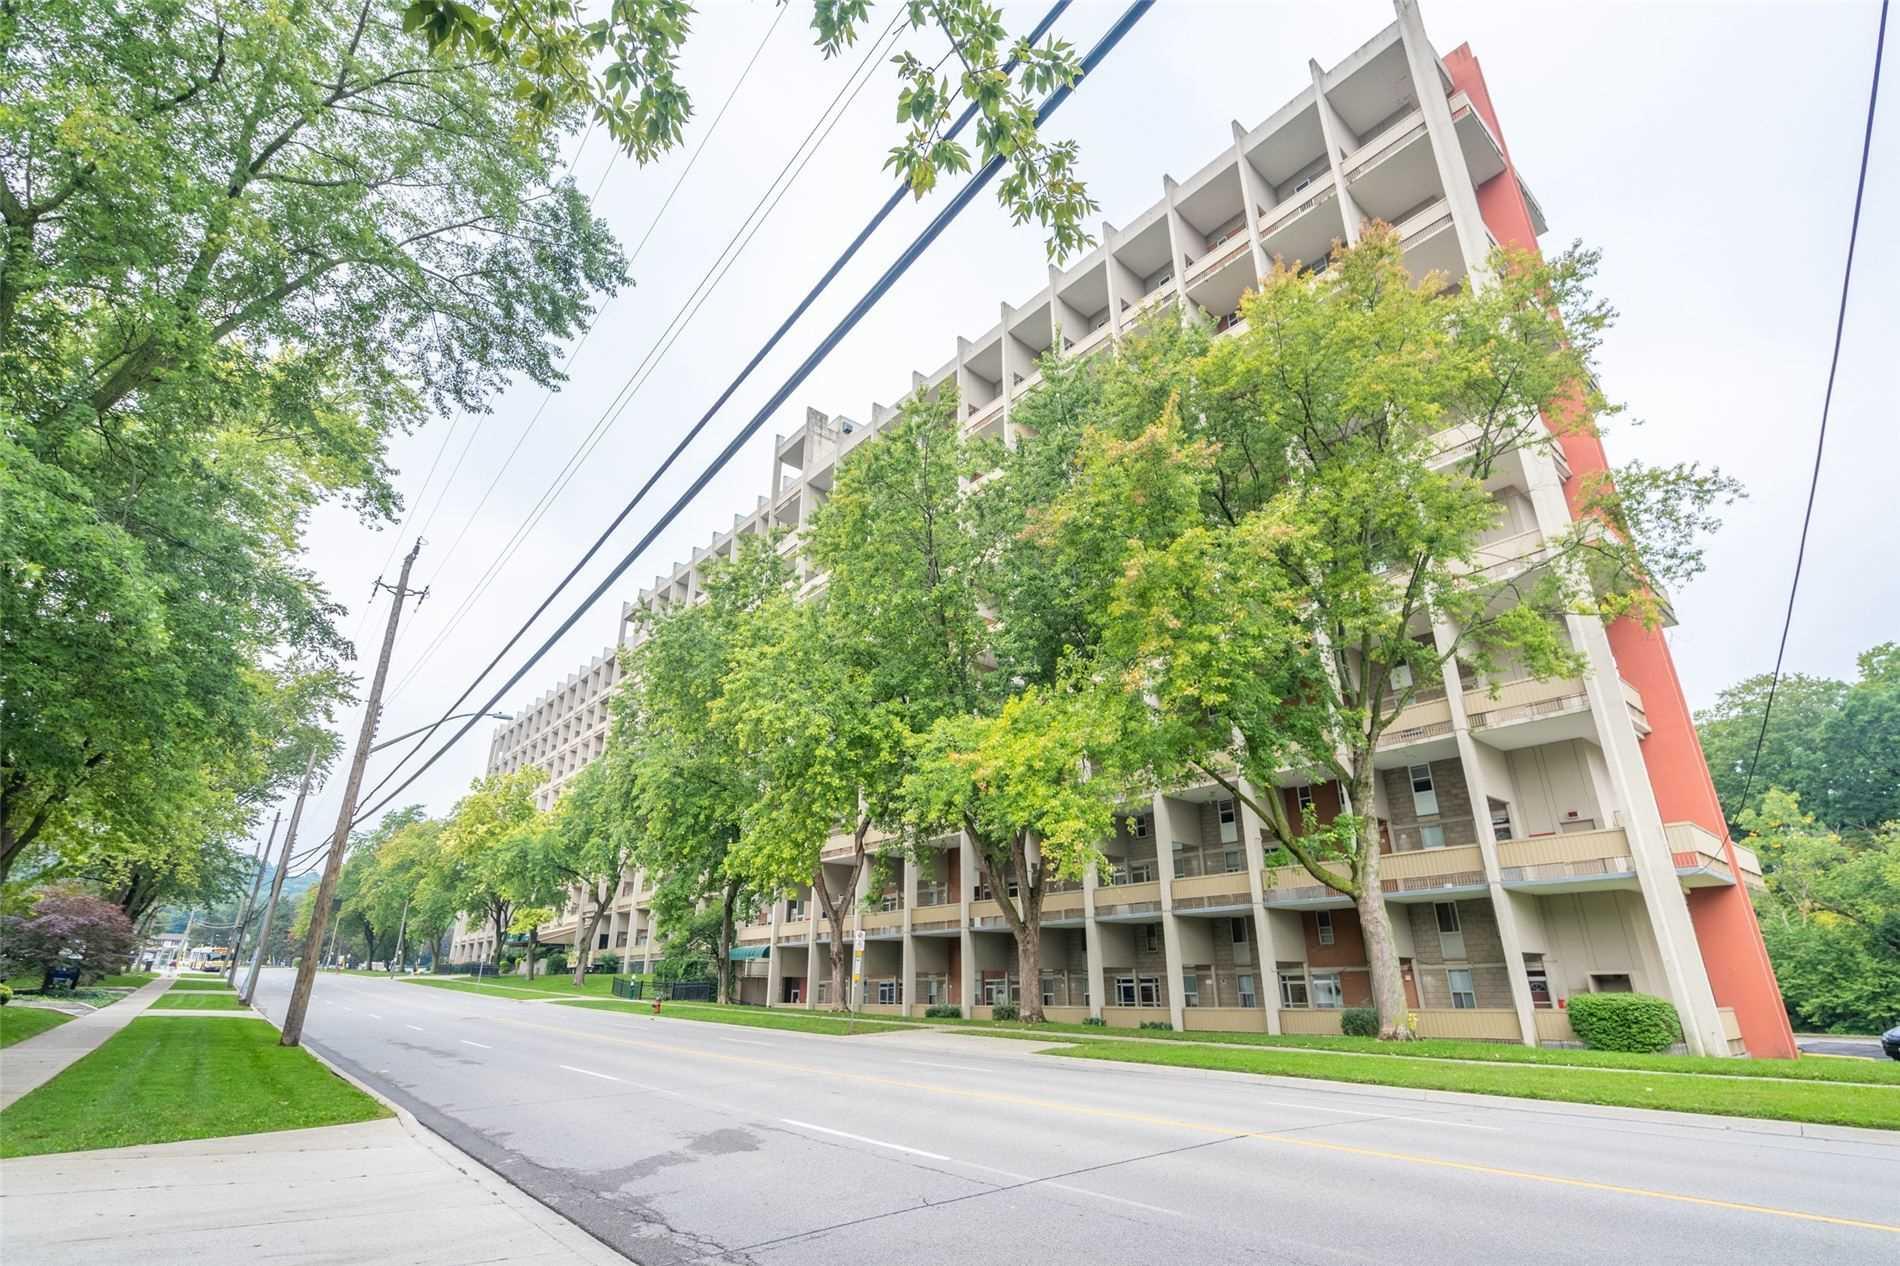 Condo Apt For Sale In Hamilton , 3 Bedrooms Bedrooms, ,1 BathroomBathrooms,Condo Apt,For Sale,537,Quigley